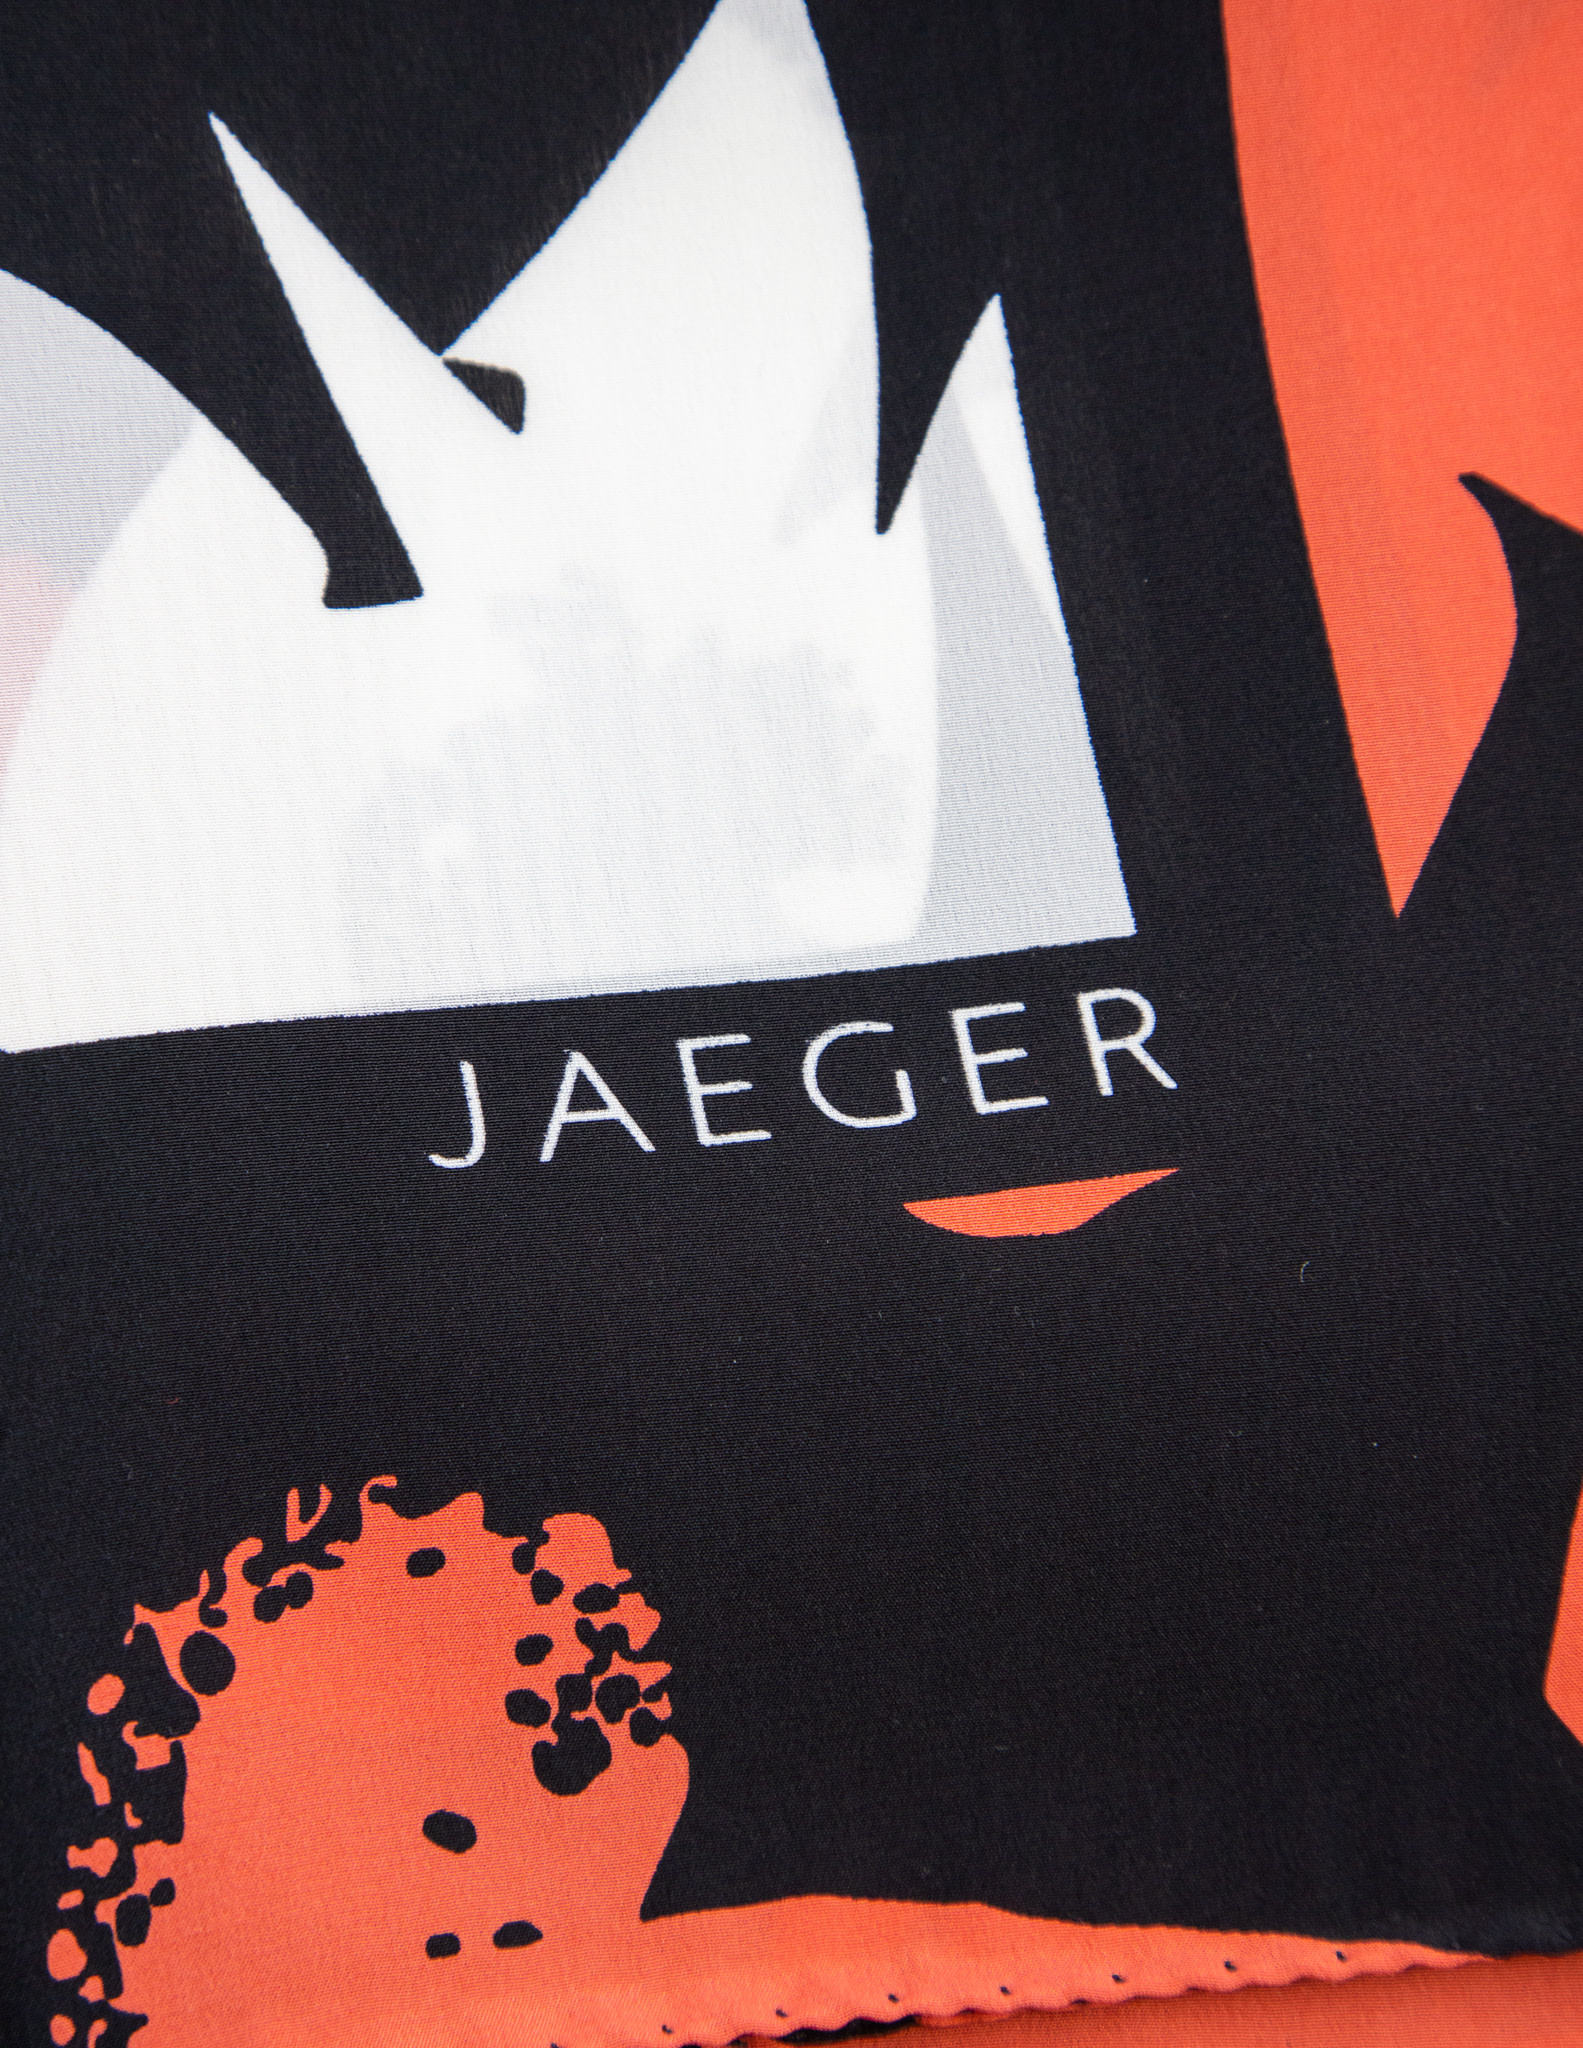 Jaeger London WHITE, BLACK & ORANGE SILK SCARF